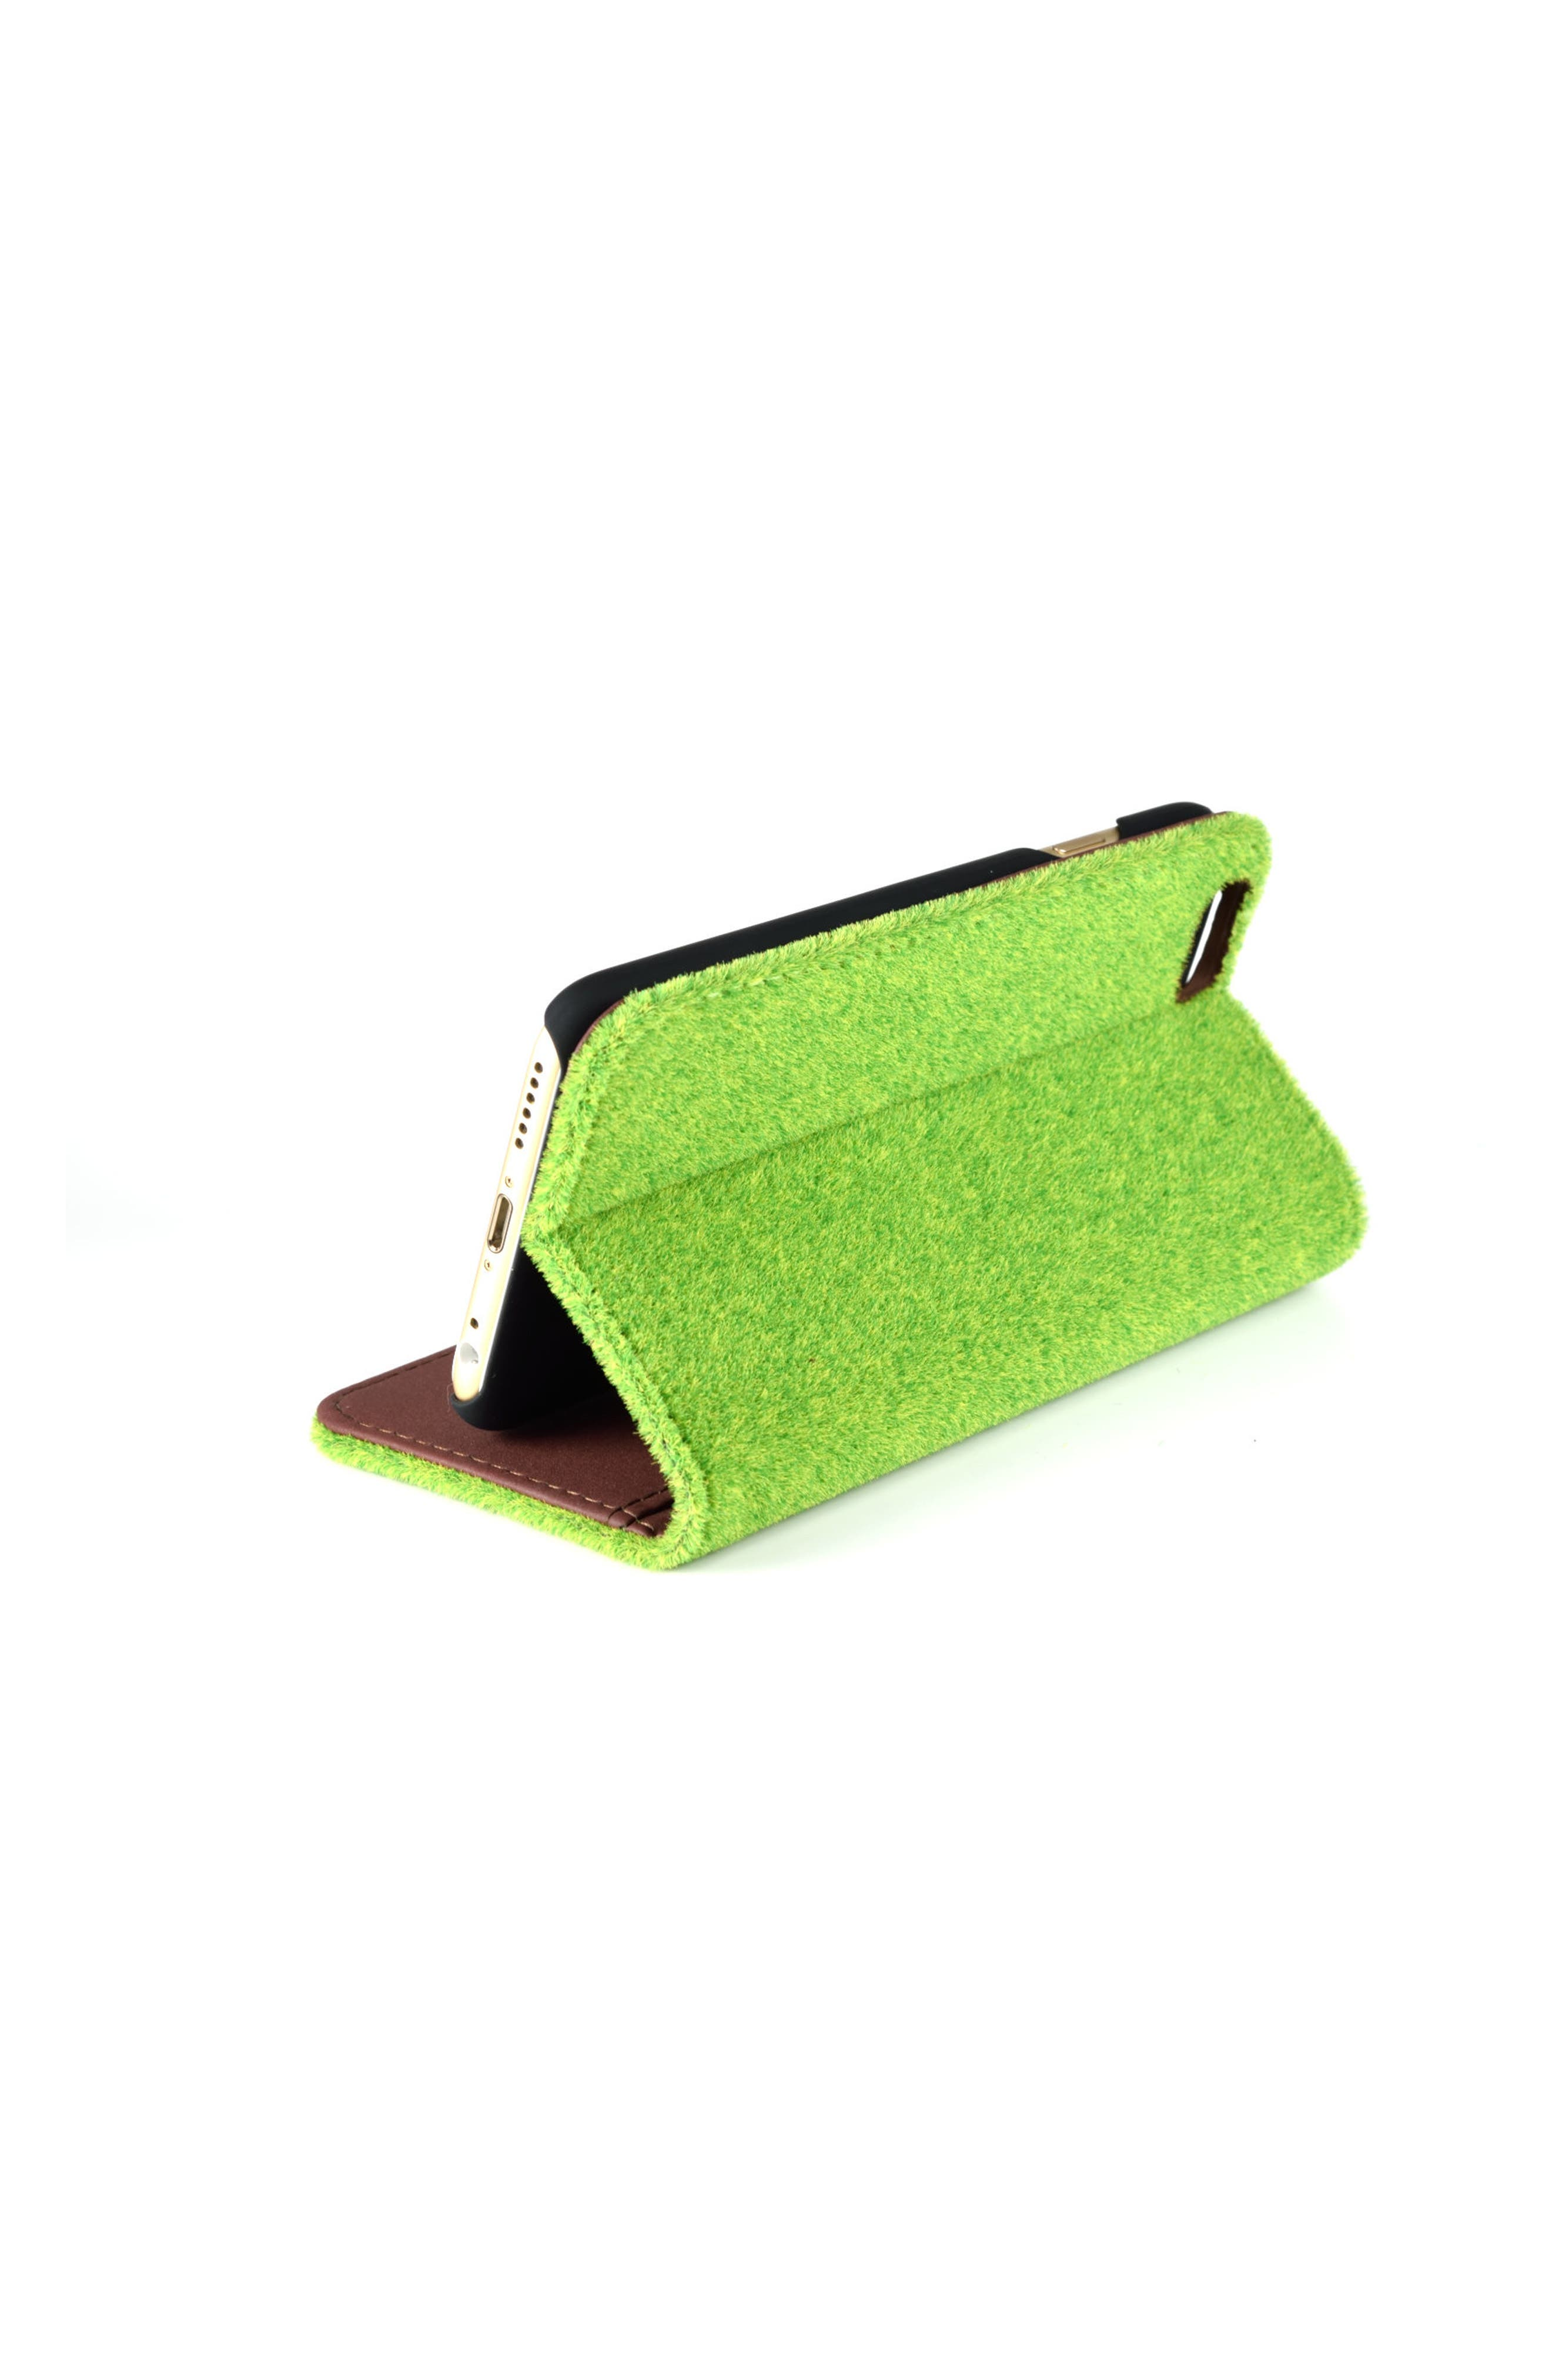 Portable Yoyogi Park iPhone 7 & iPhone 7 Plus Flip Cover Case,                             Alternate thumbnail 4, color,                             301